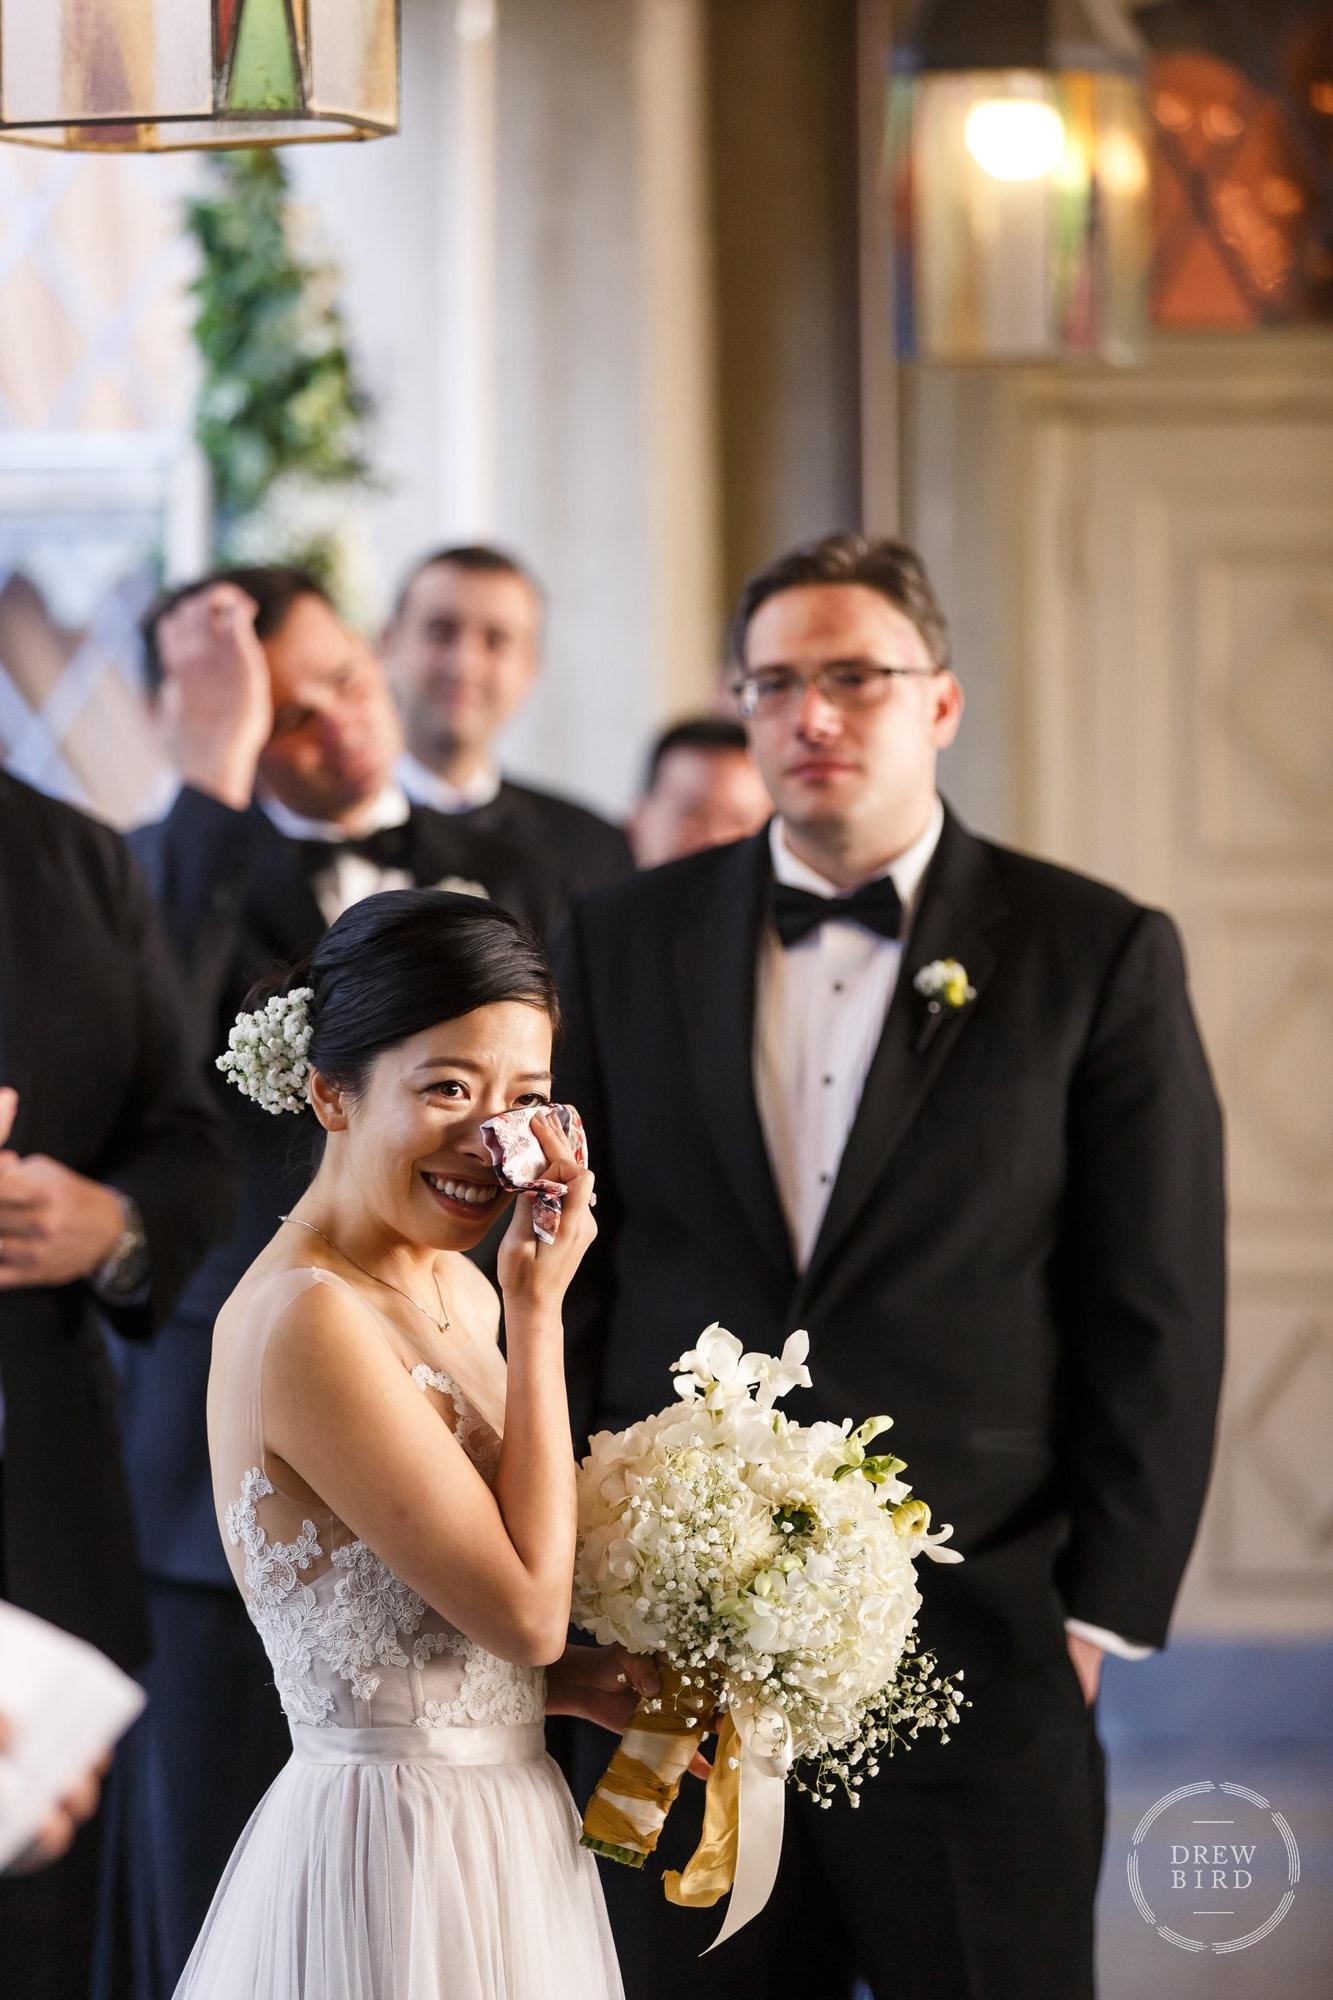 Jessica + Ryan Wedding. Berkeley City Club Wedding. Berkeley Wedding Photographer. San Francisco Wedding Photojournalism. Julia Morgan Architecture Wedding. Drew Bird Photography.